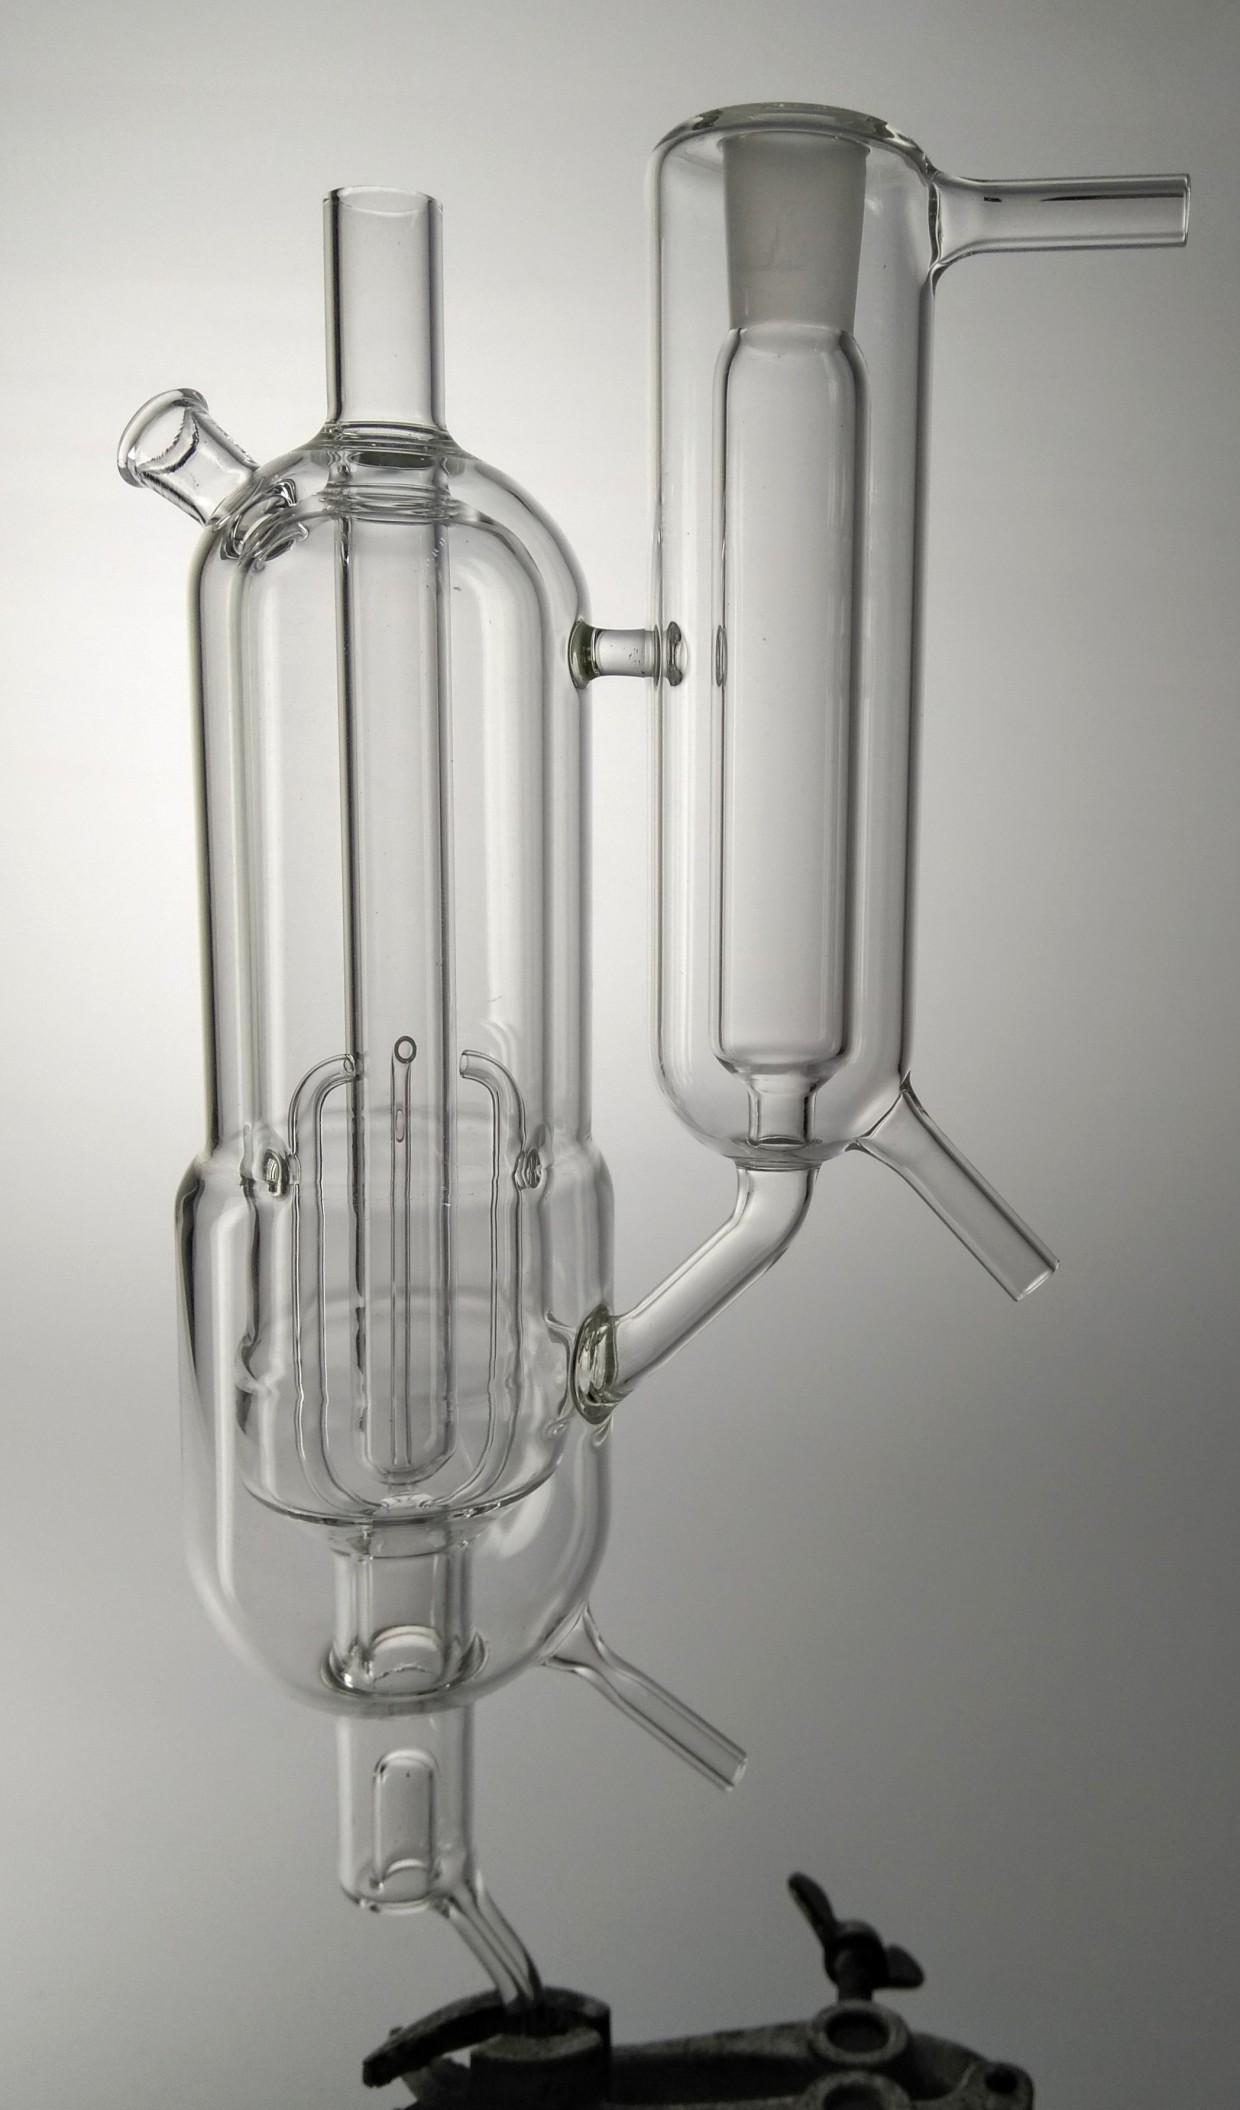 moleculair gew.bep. apparaat